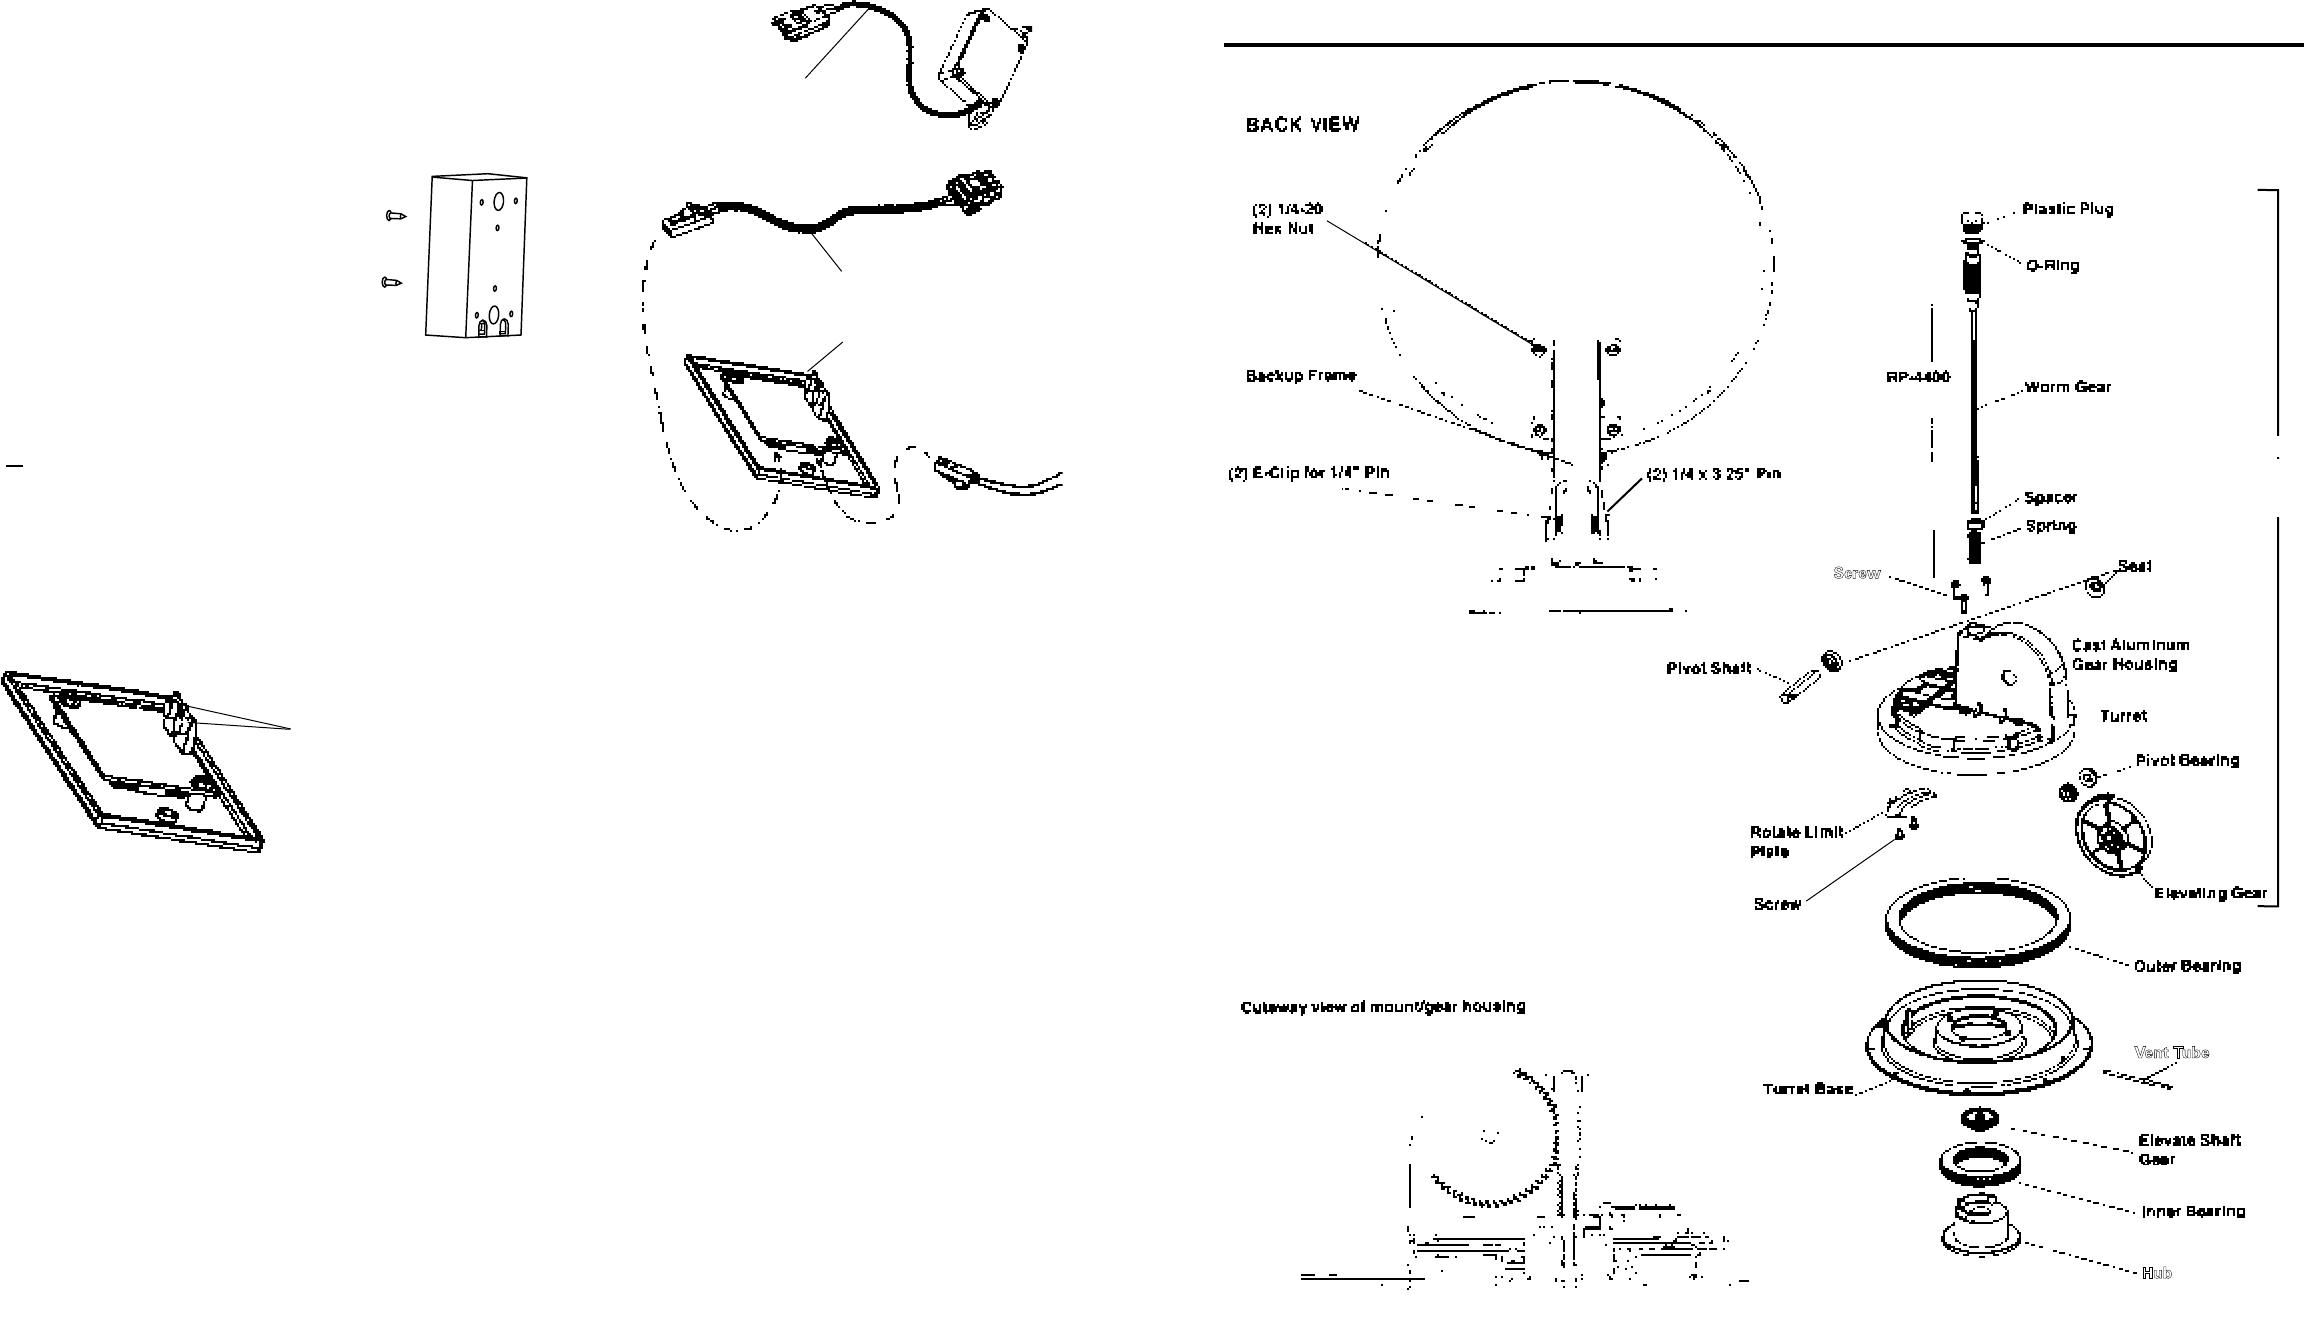 Winegard RM-DM46, RM-DM00, RMDM04, RMFLDM4 Parts List